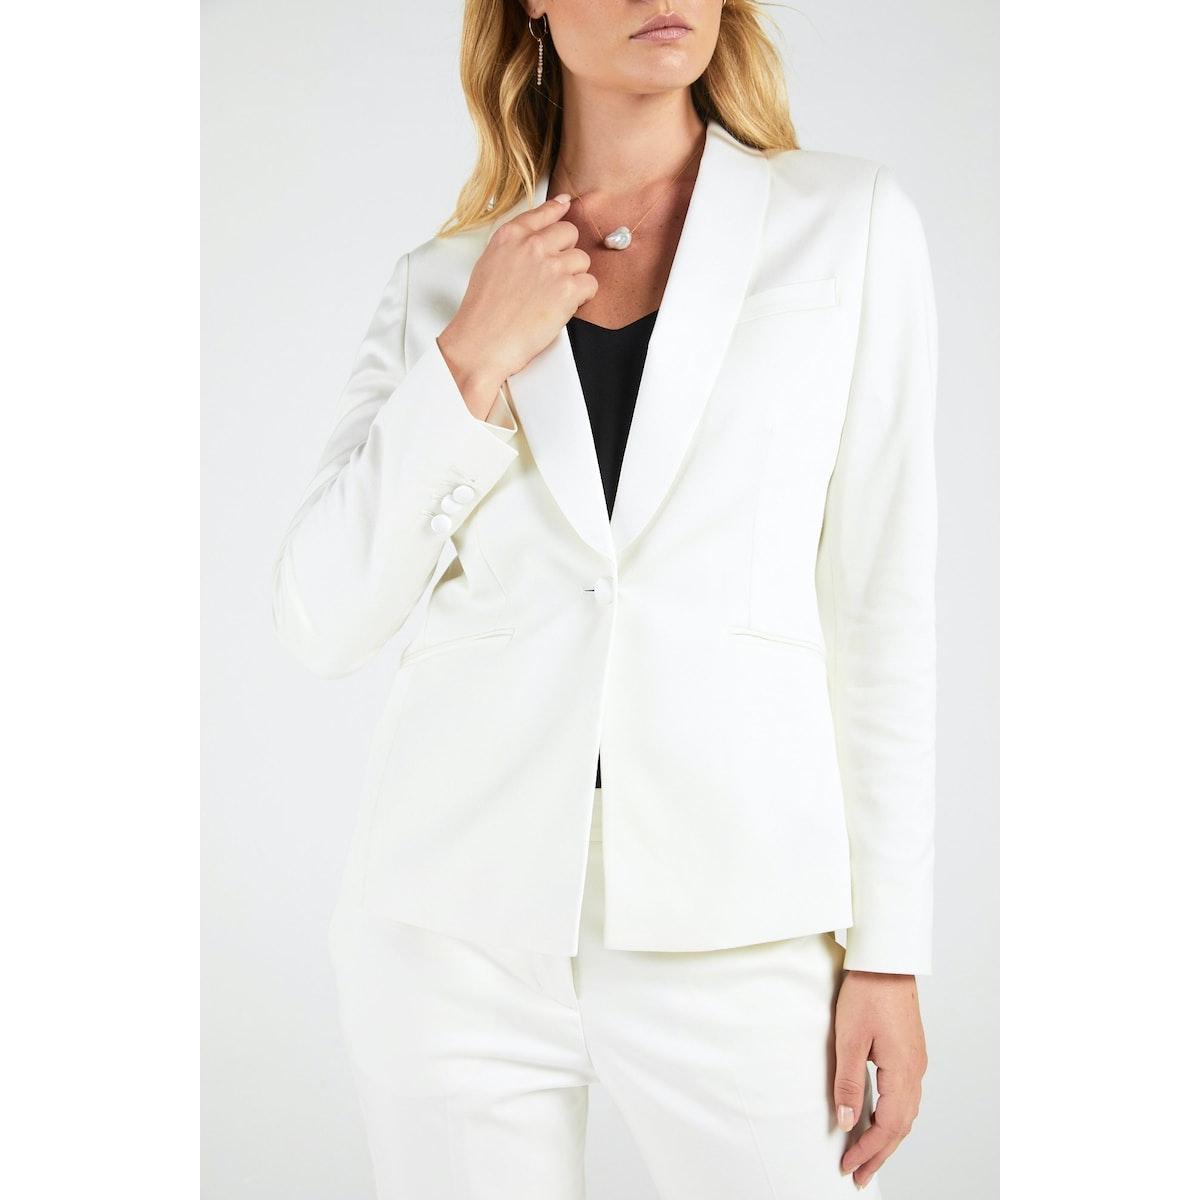 InStitchu Collection The Curtis Ivory Tuxedo Jacket